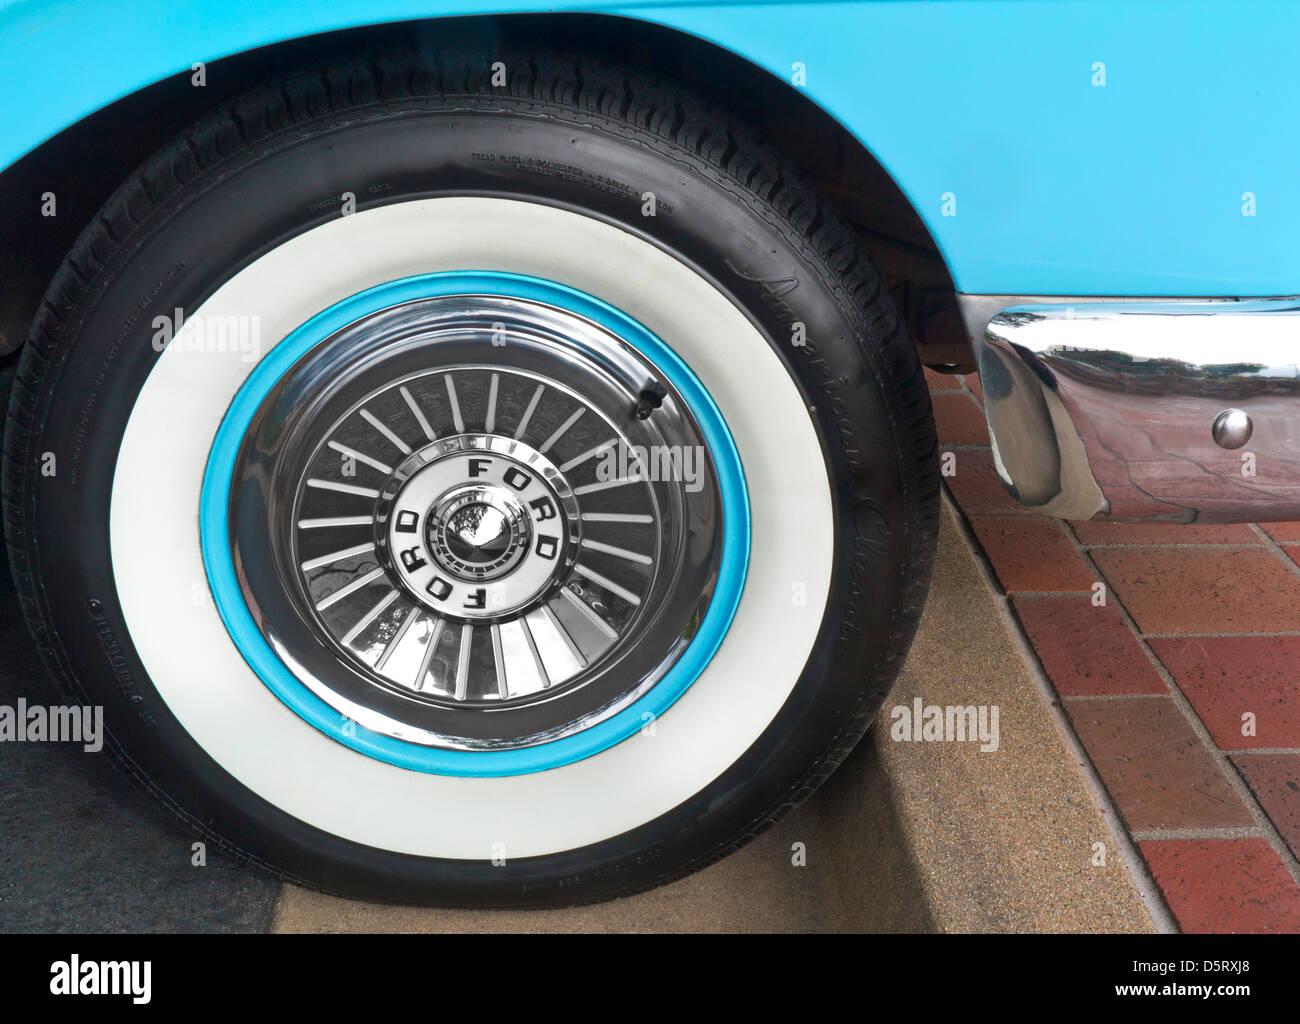 Detail auf 1950 Ford Fairlane Skyliner American classic motor Chrom Kappe und Whitewall Radreifen Stockbild